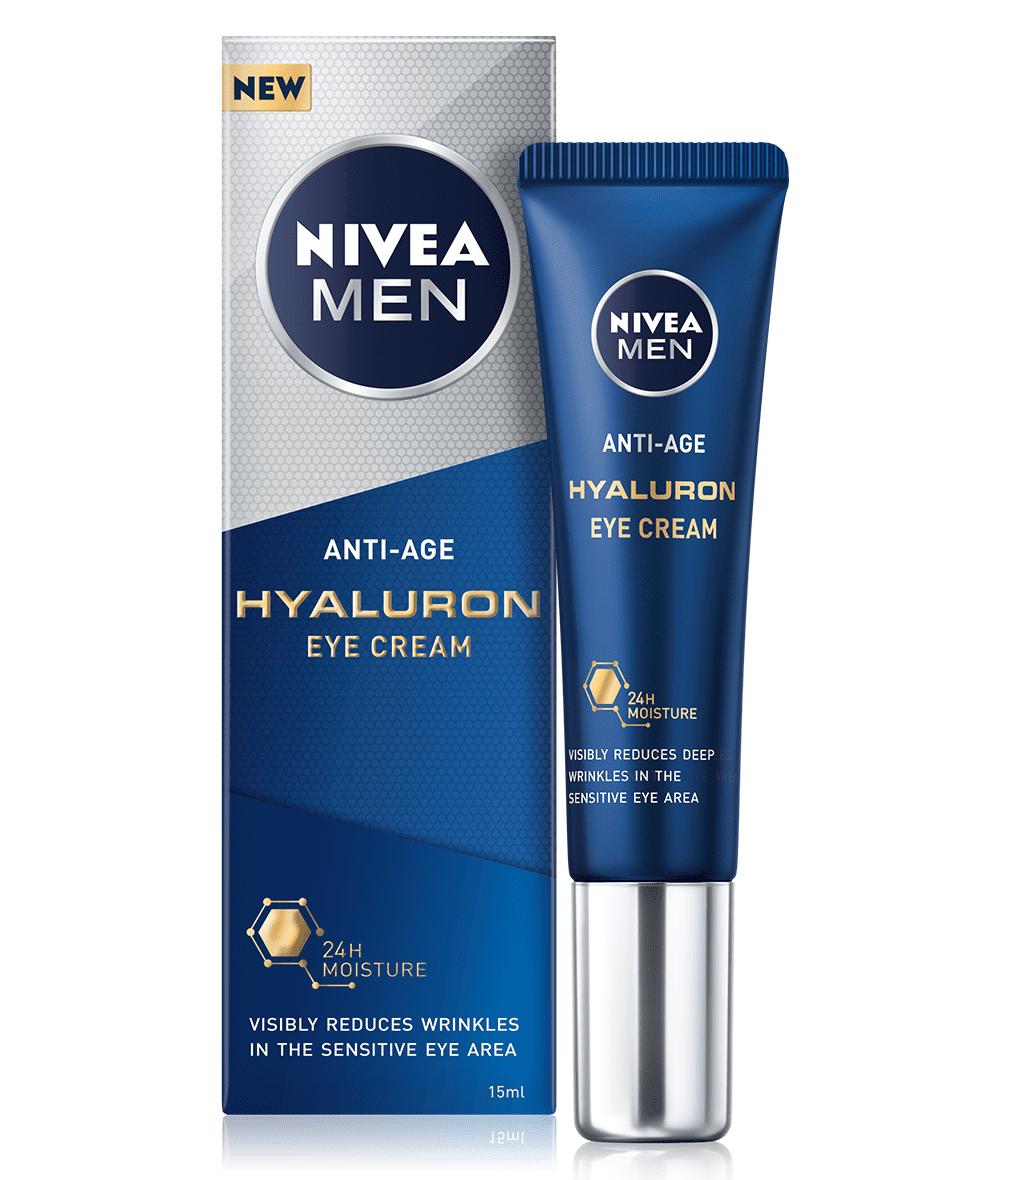 83998_NIVEA_MEN_AntiAge_Hyaluron_EyeCream_Tube_FOBO_15ml_layer 2